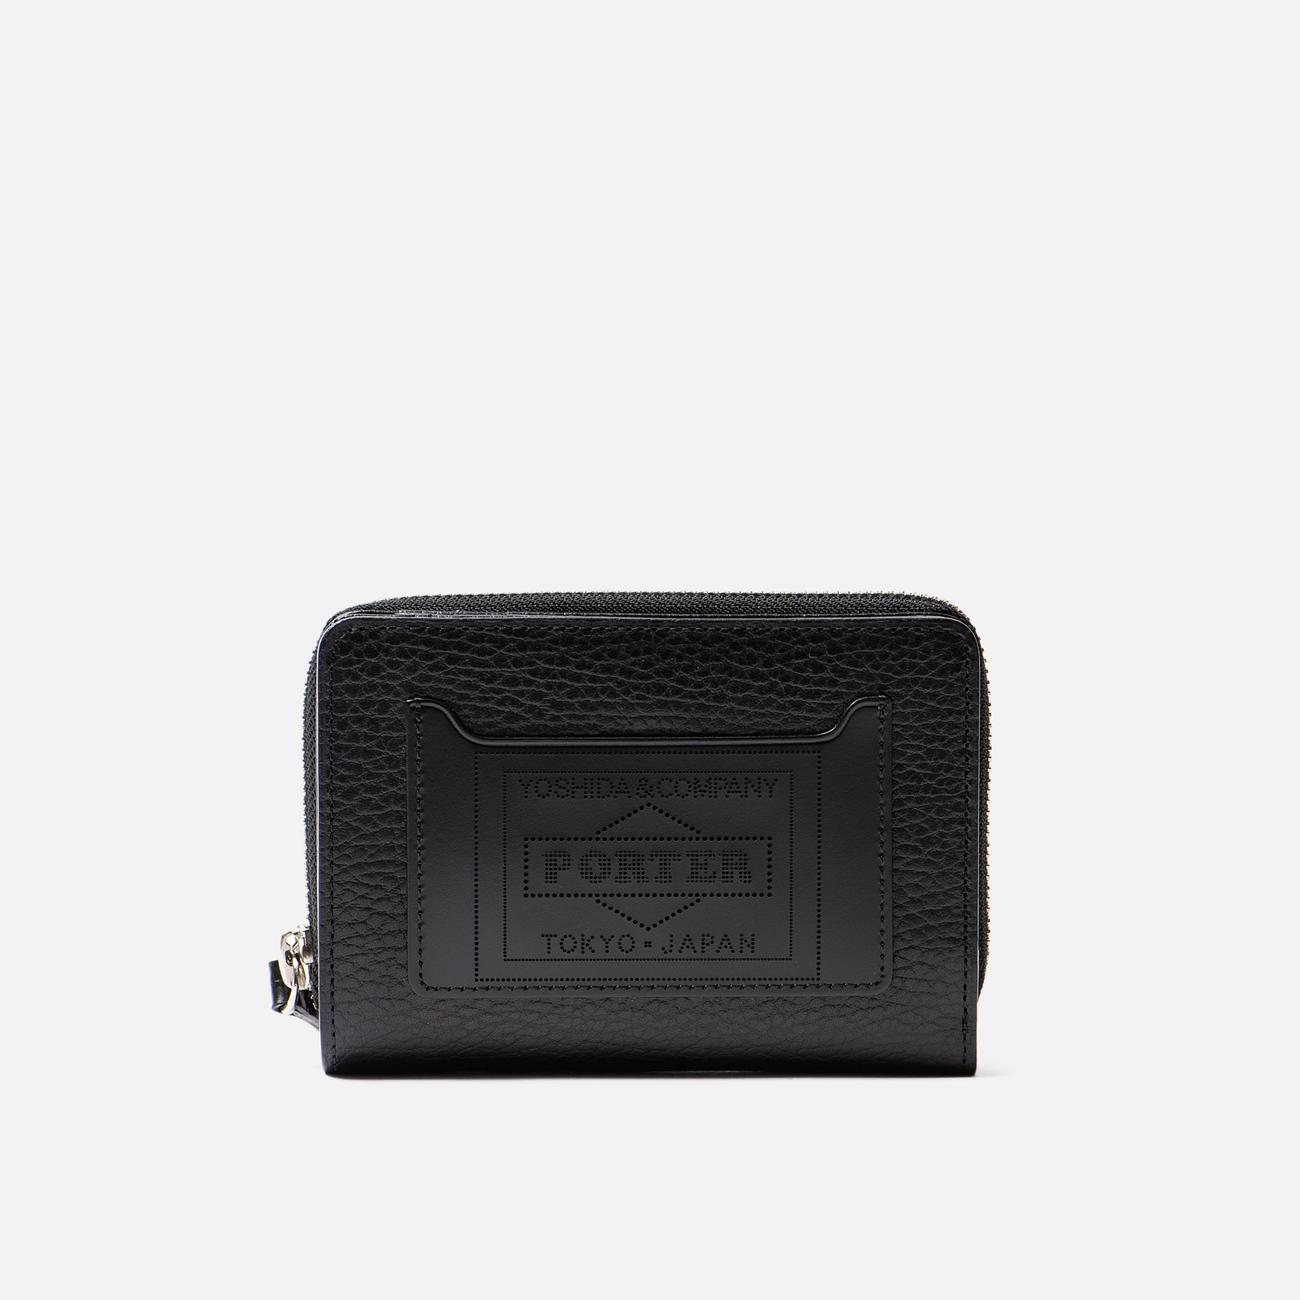 Кошелек Porter-Yoshida & Co Glaze Leather Bi-Fold Black